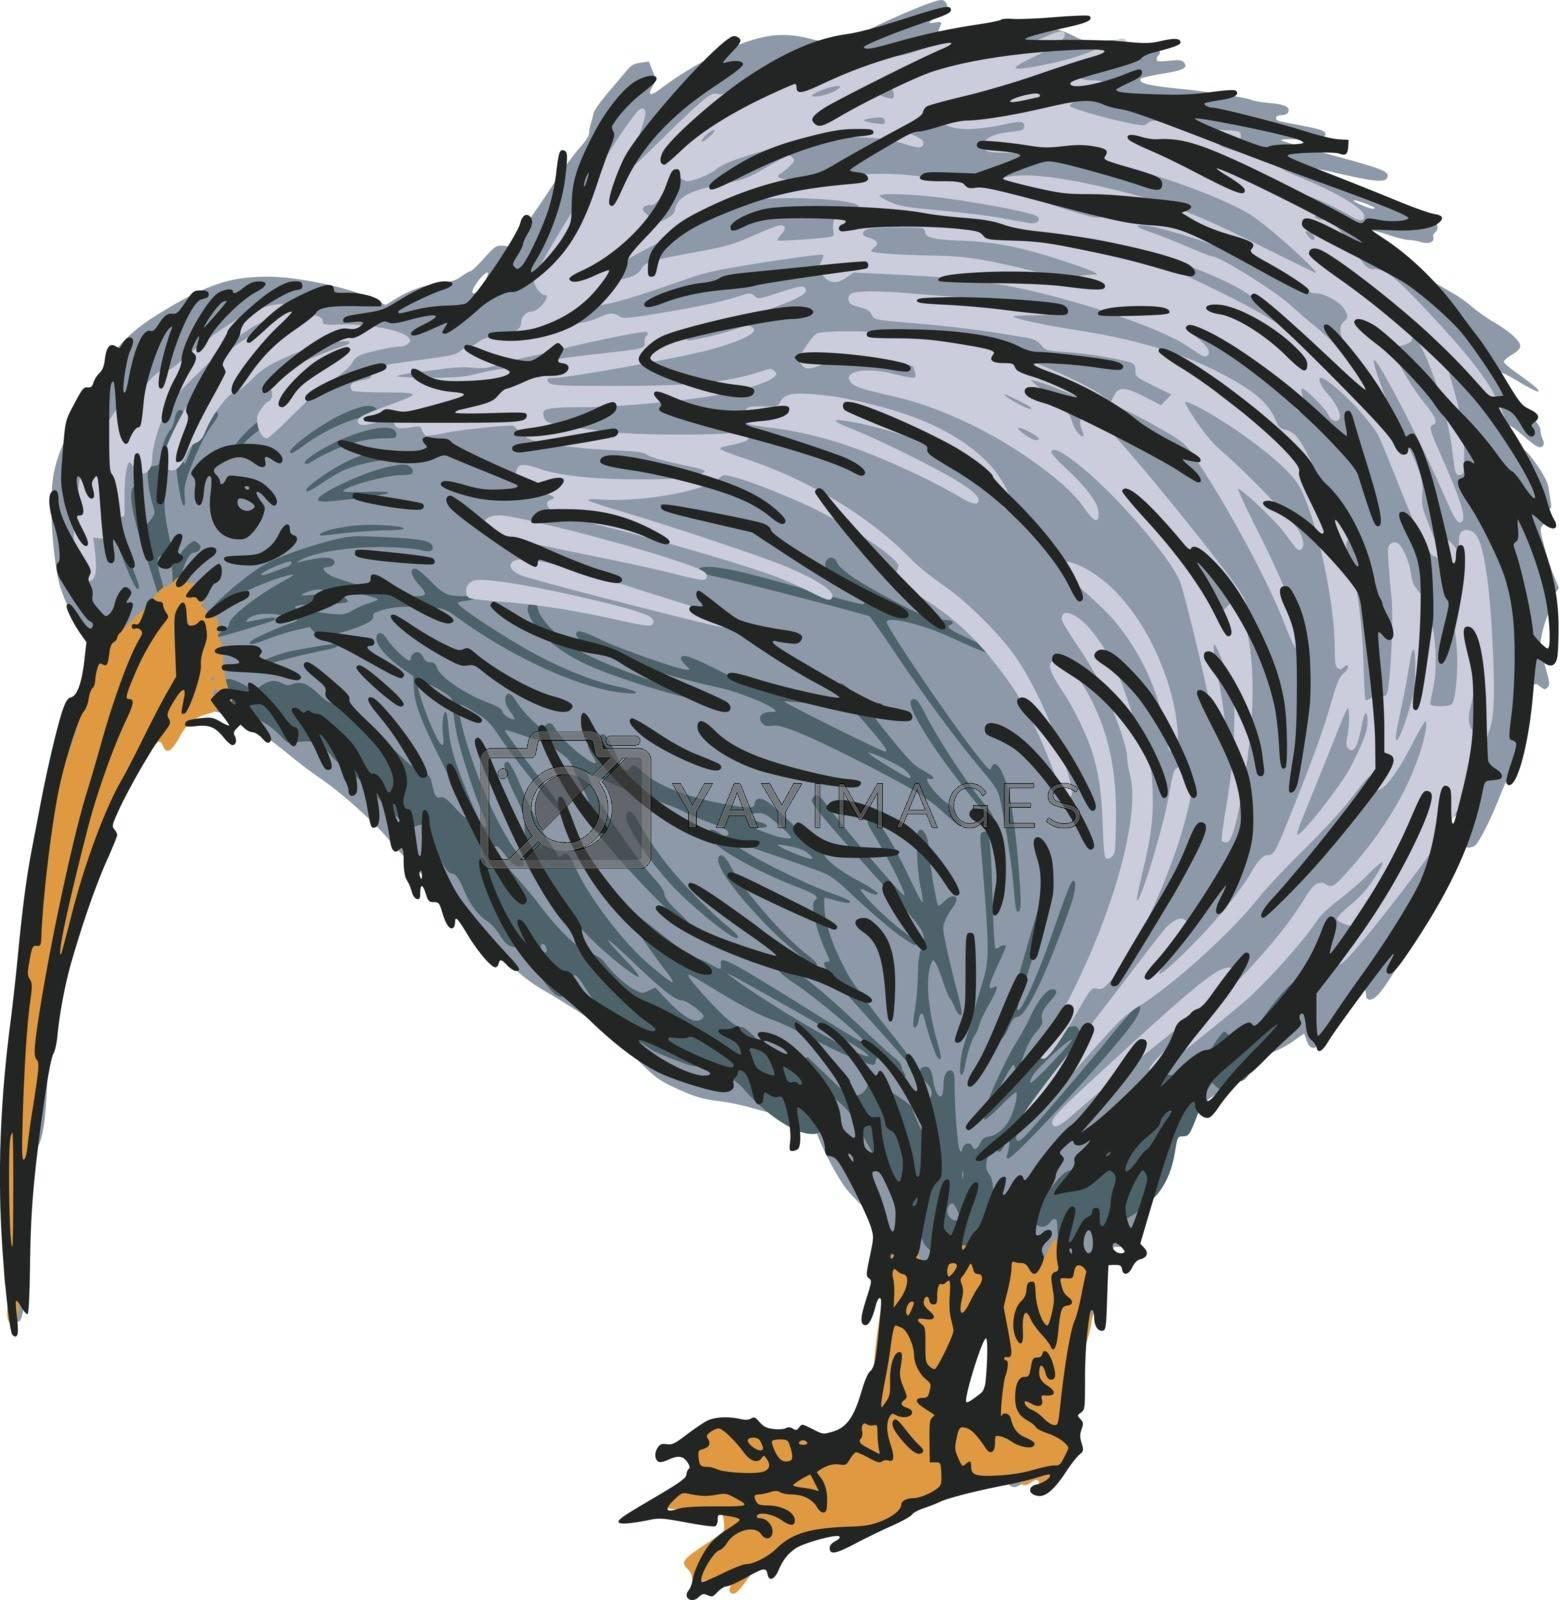 Royalty free image of kiwi bird by Perysty